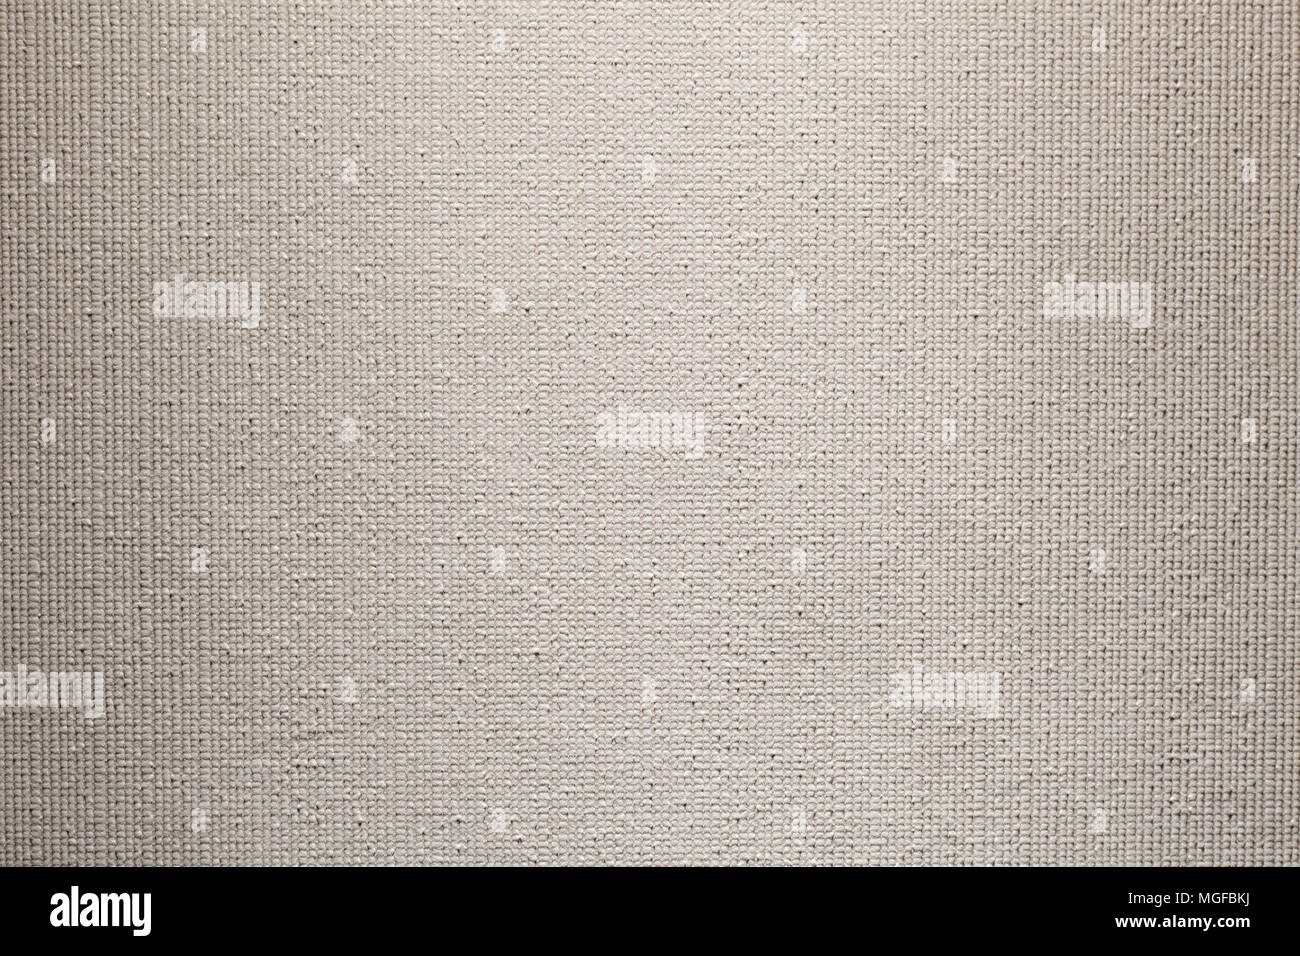 Fibrous Tissue Stockfotos & Fibrous Tissue Bilder - Alamy